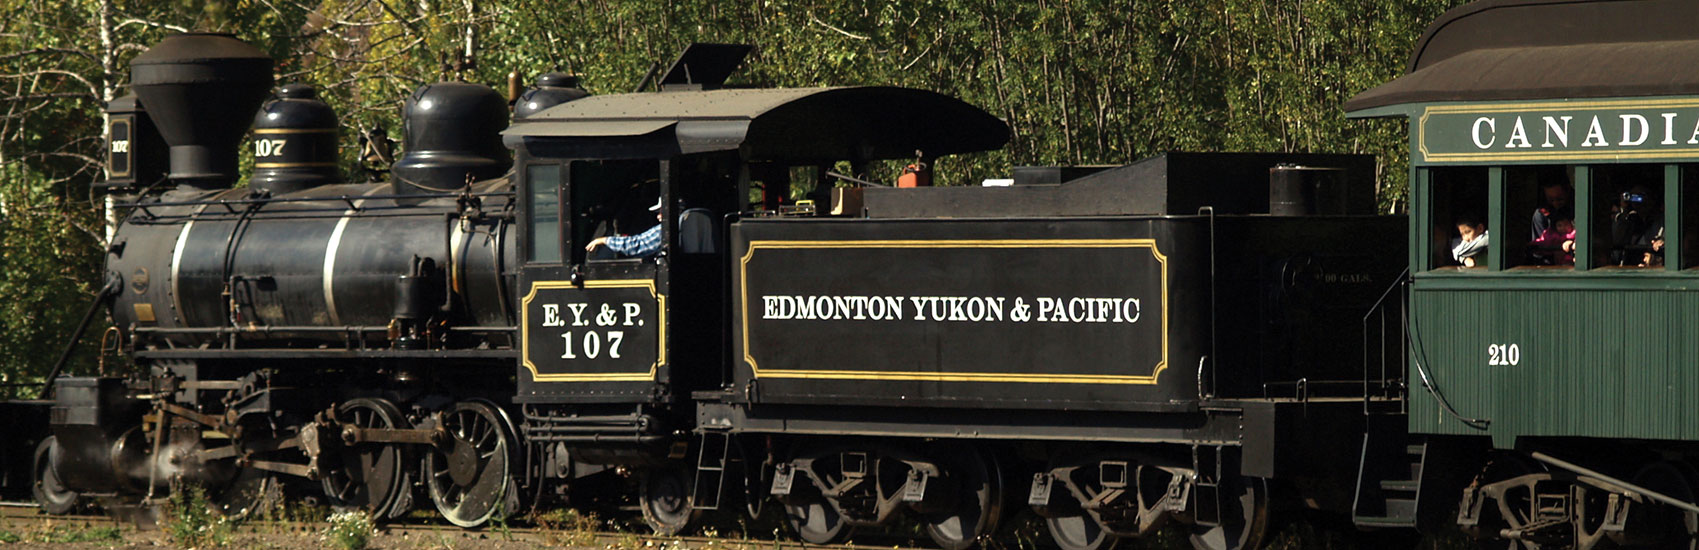 See Canada - Edmonton 5